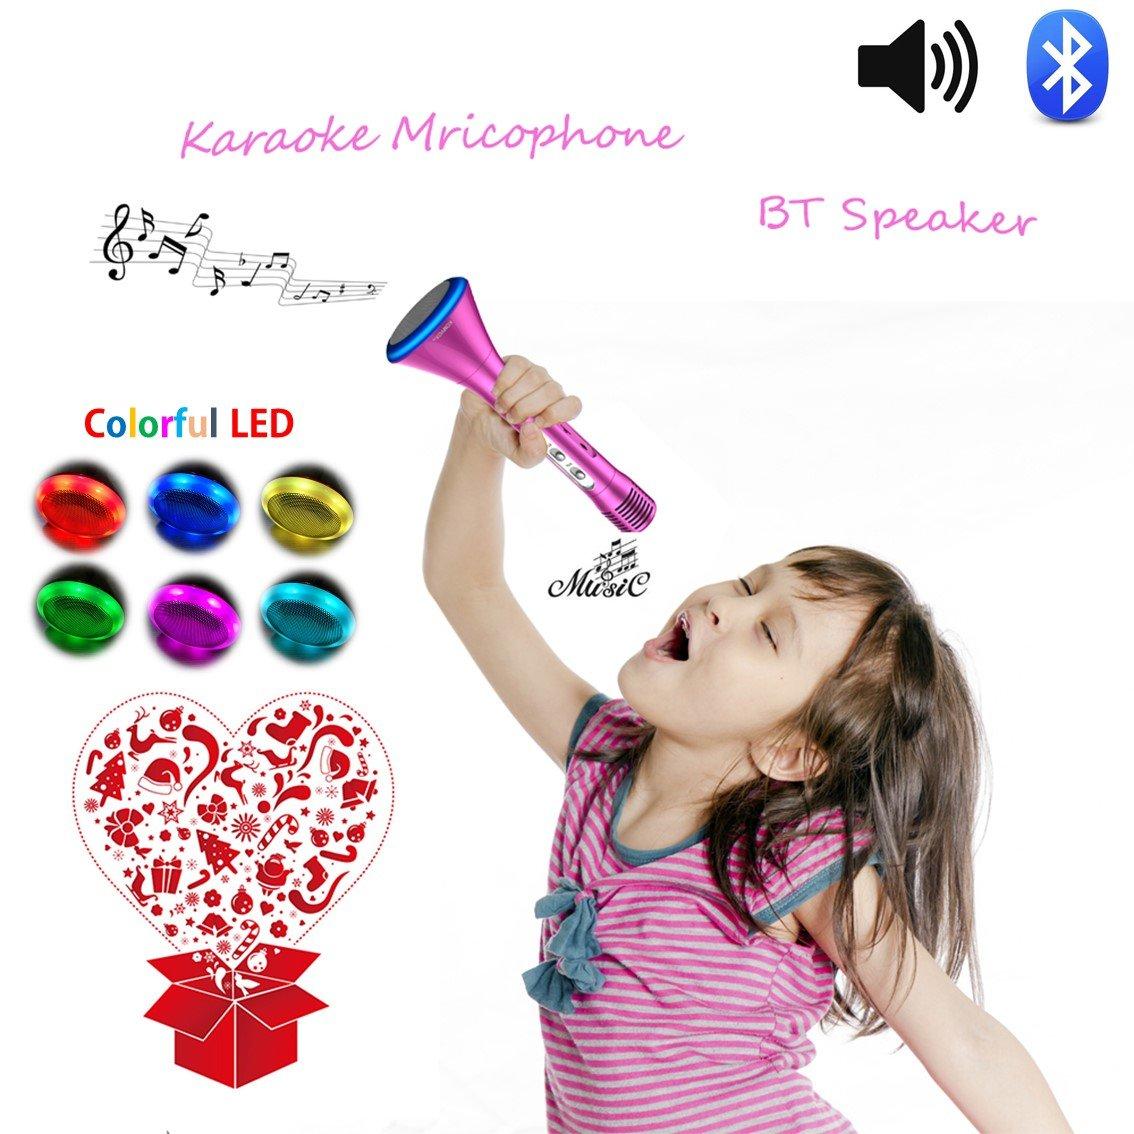 Altavoz Con Microfono Karaoke Para Niños, Chicas Juguetes de Micrófono, Máquina de Canto Infantil Inalámbrica Bluetooth, Equipo de Canto de Fiesta Al Aire Libre Con Diseño de Princesa, Juegos de Baile de Familia Cantando Regalos, Juguetes Electrónicos Crea